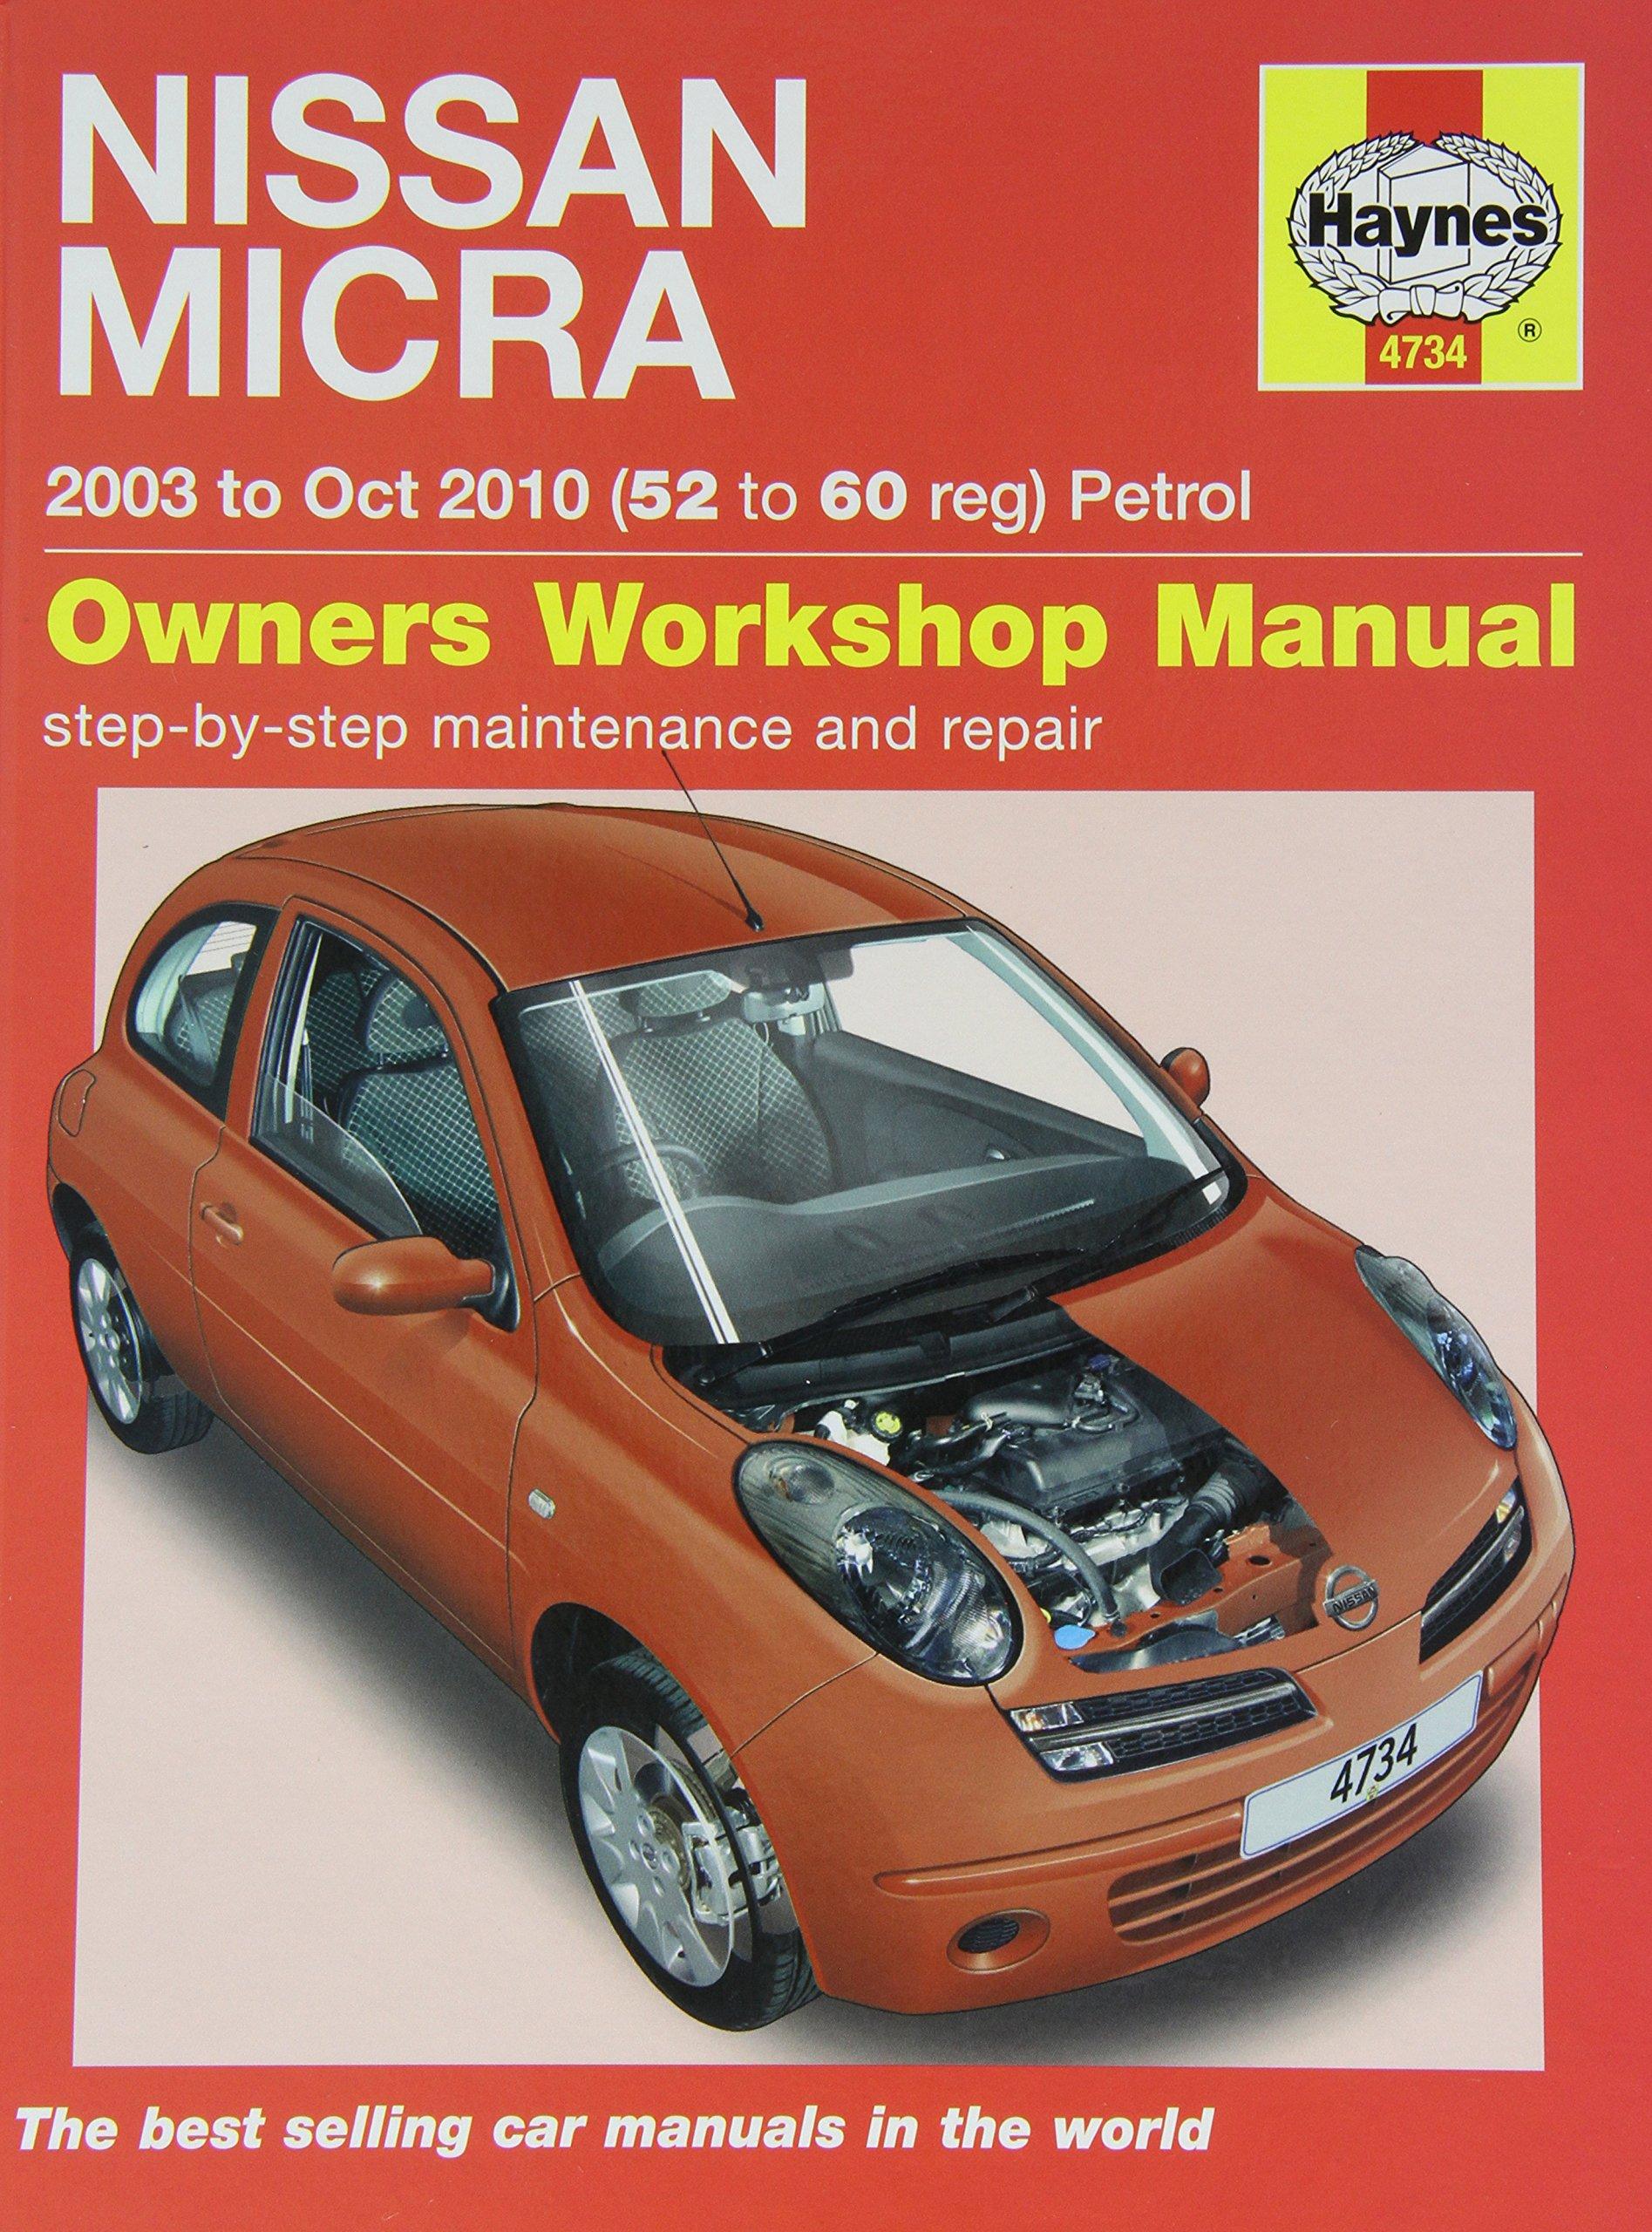 Haynes 4734 Service and Repair Workshop Manual: Amazon.co.uk:  0638876410045: Books